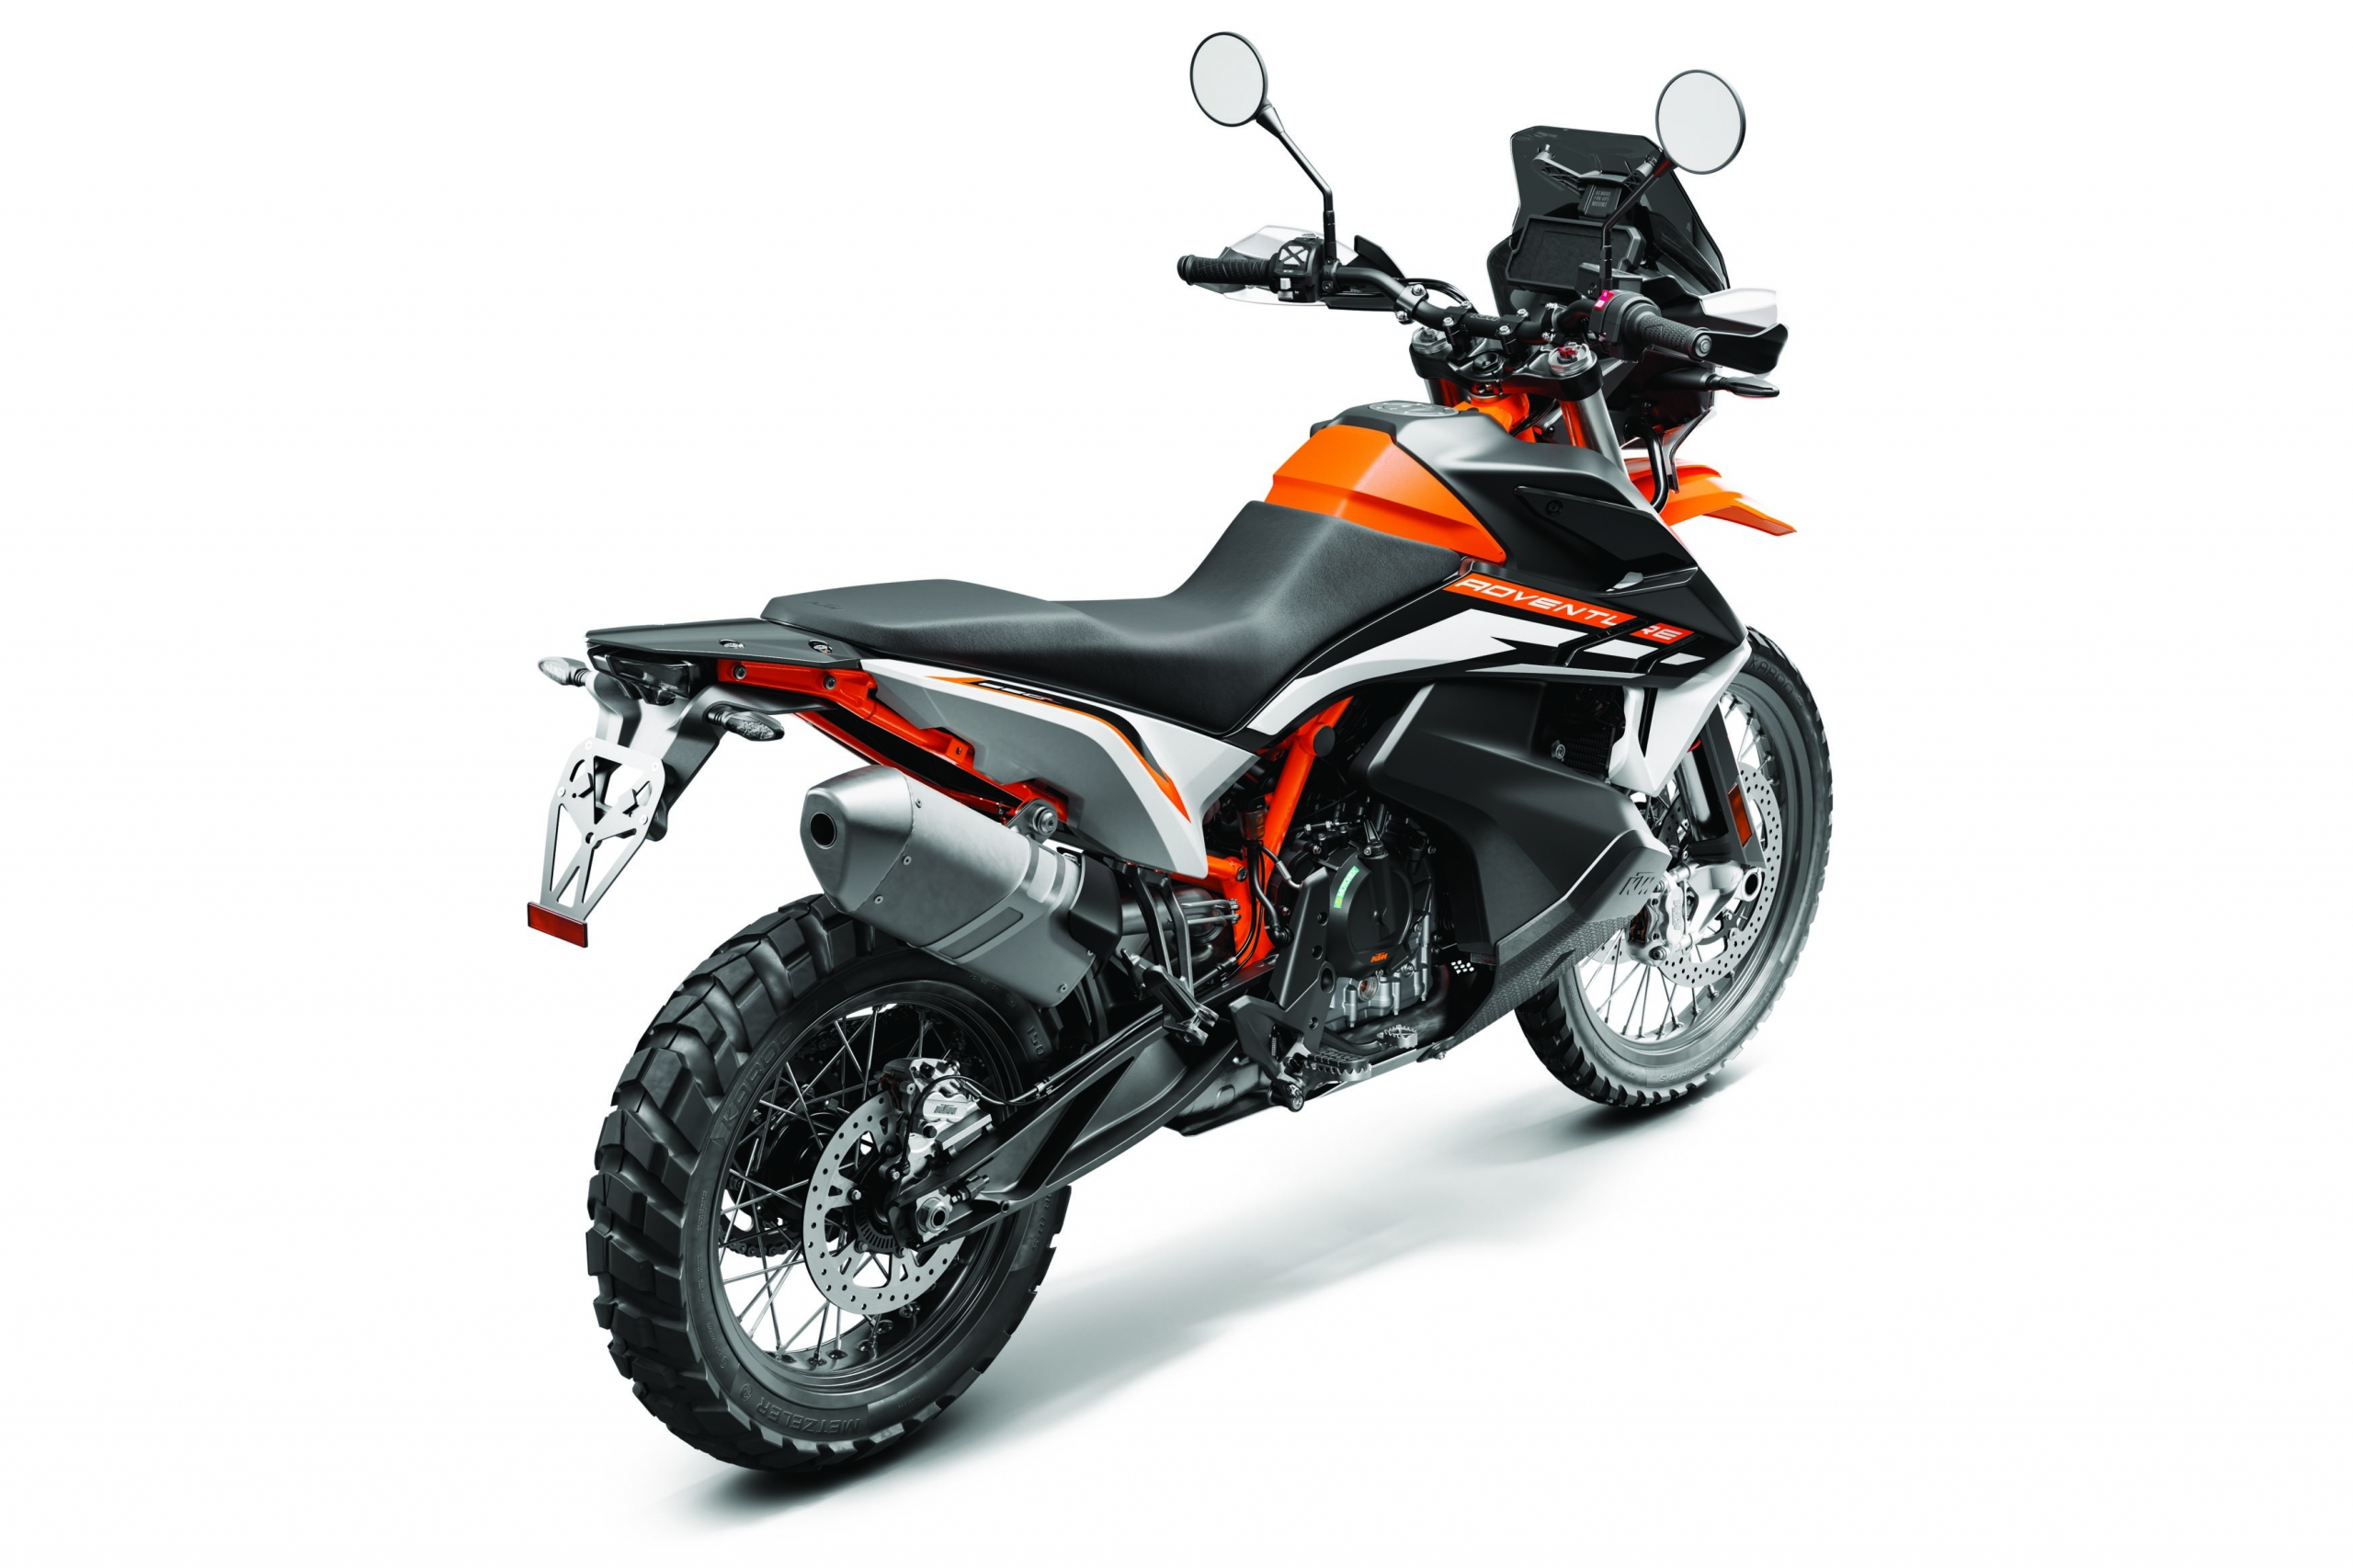 KTM 890 Adventure R 2021